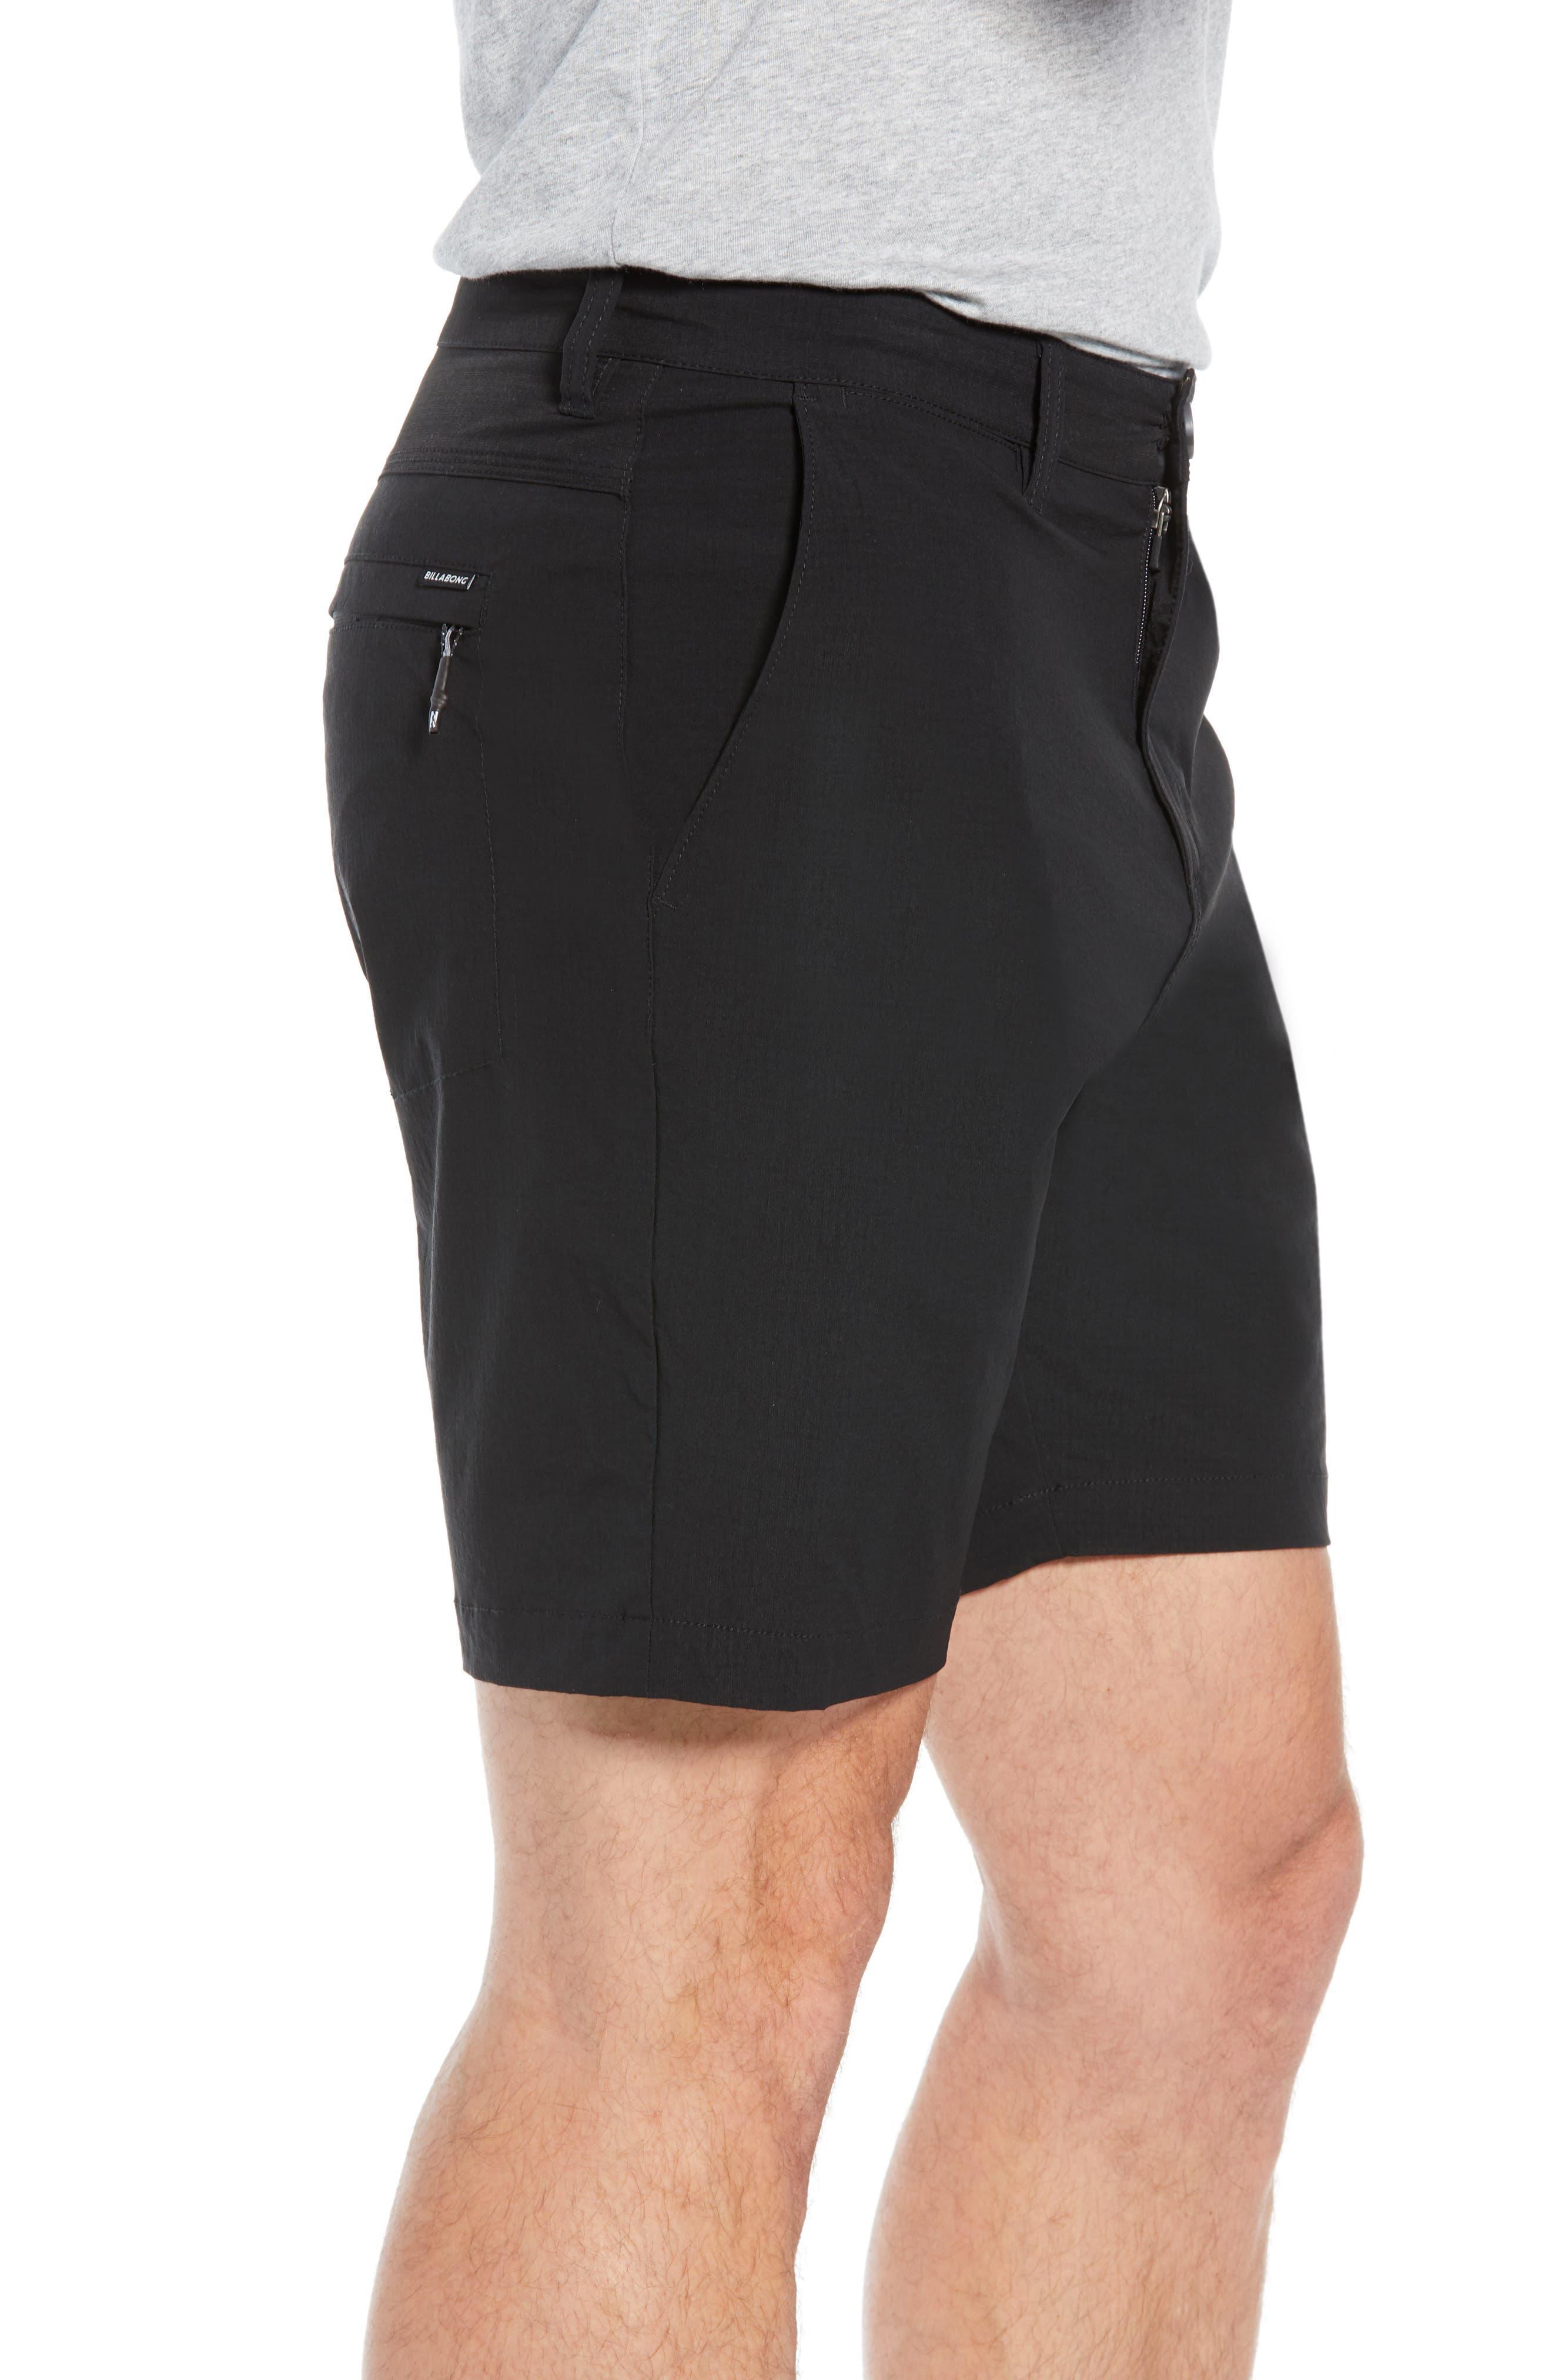 Surfreak Hybrid Shorts,                             Alternate thumbnail 3, color,                             BLACK